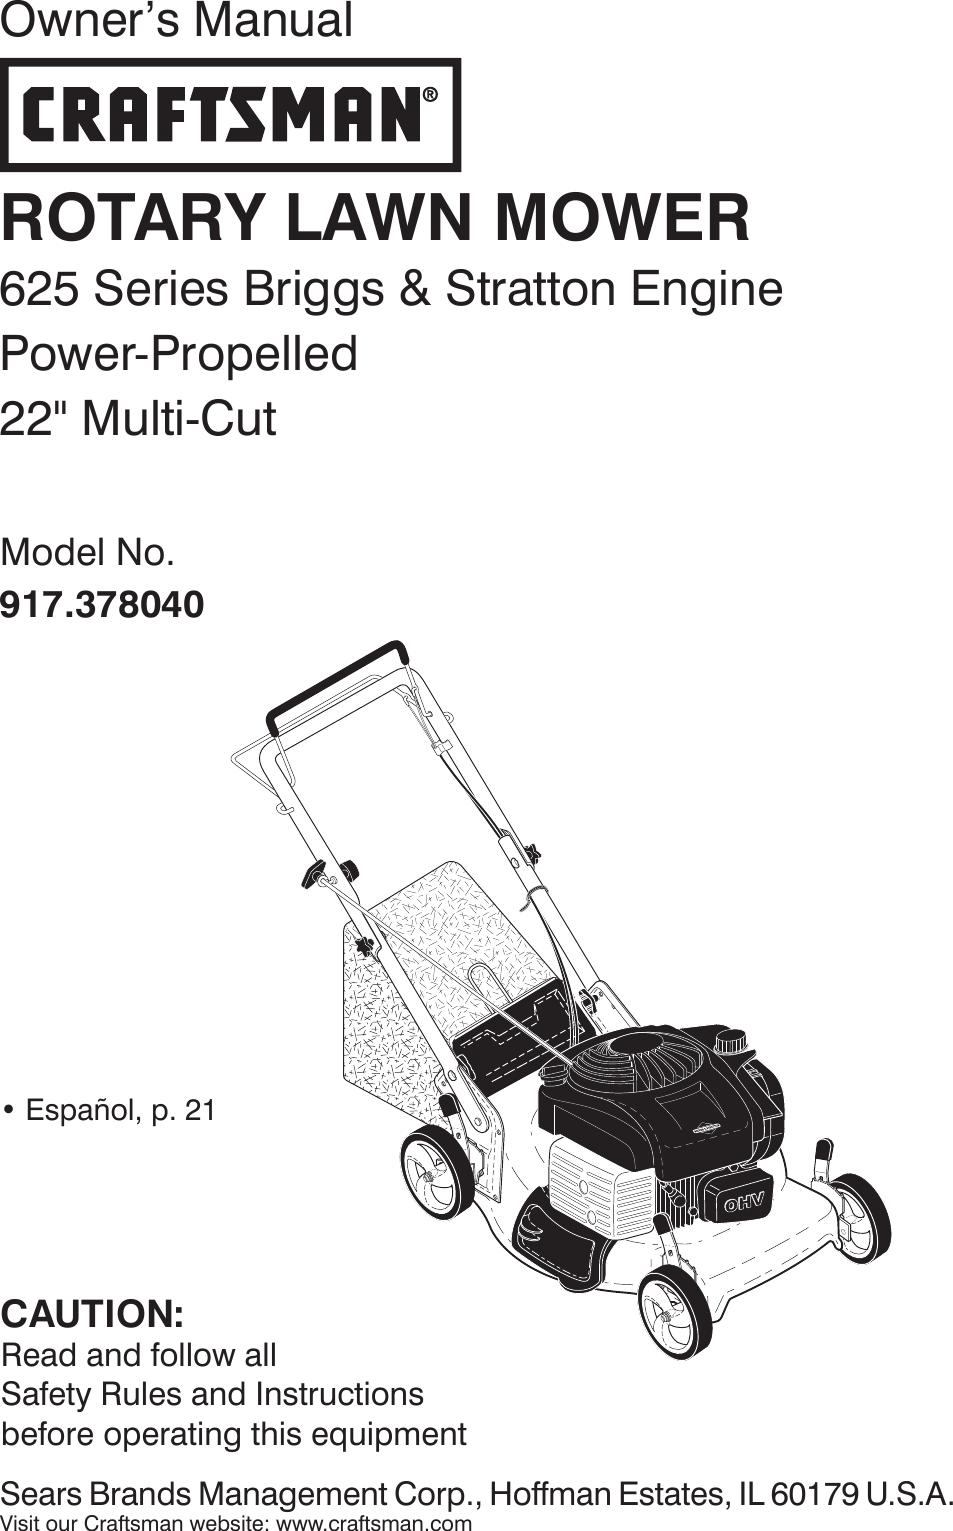 Craftsman 917378040 378040 es 590056401_r0 User Manual